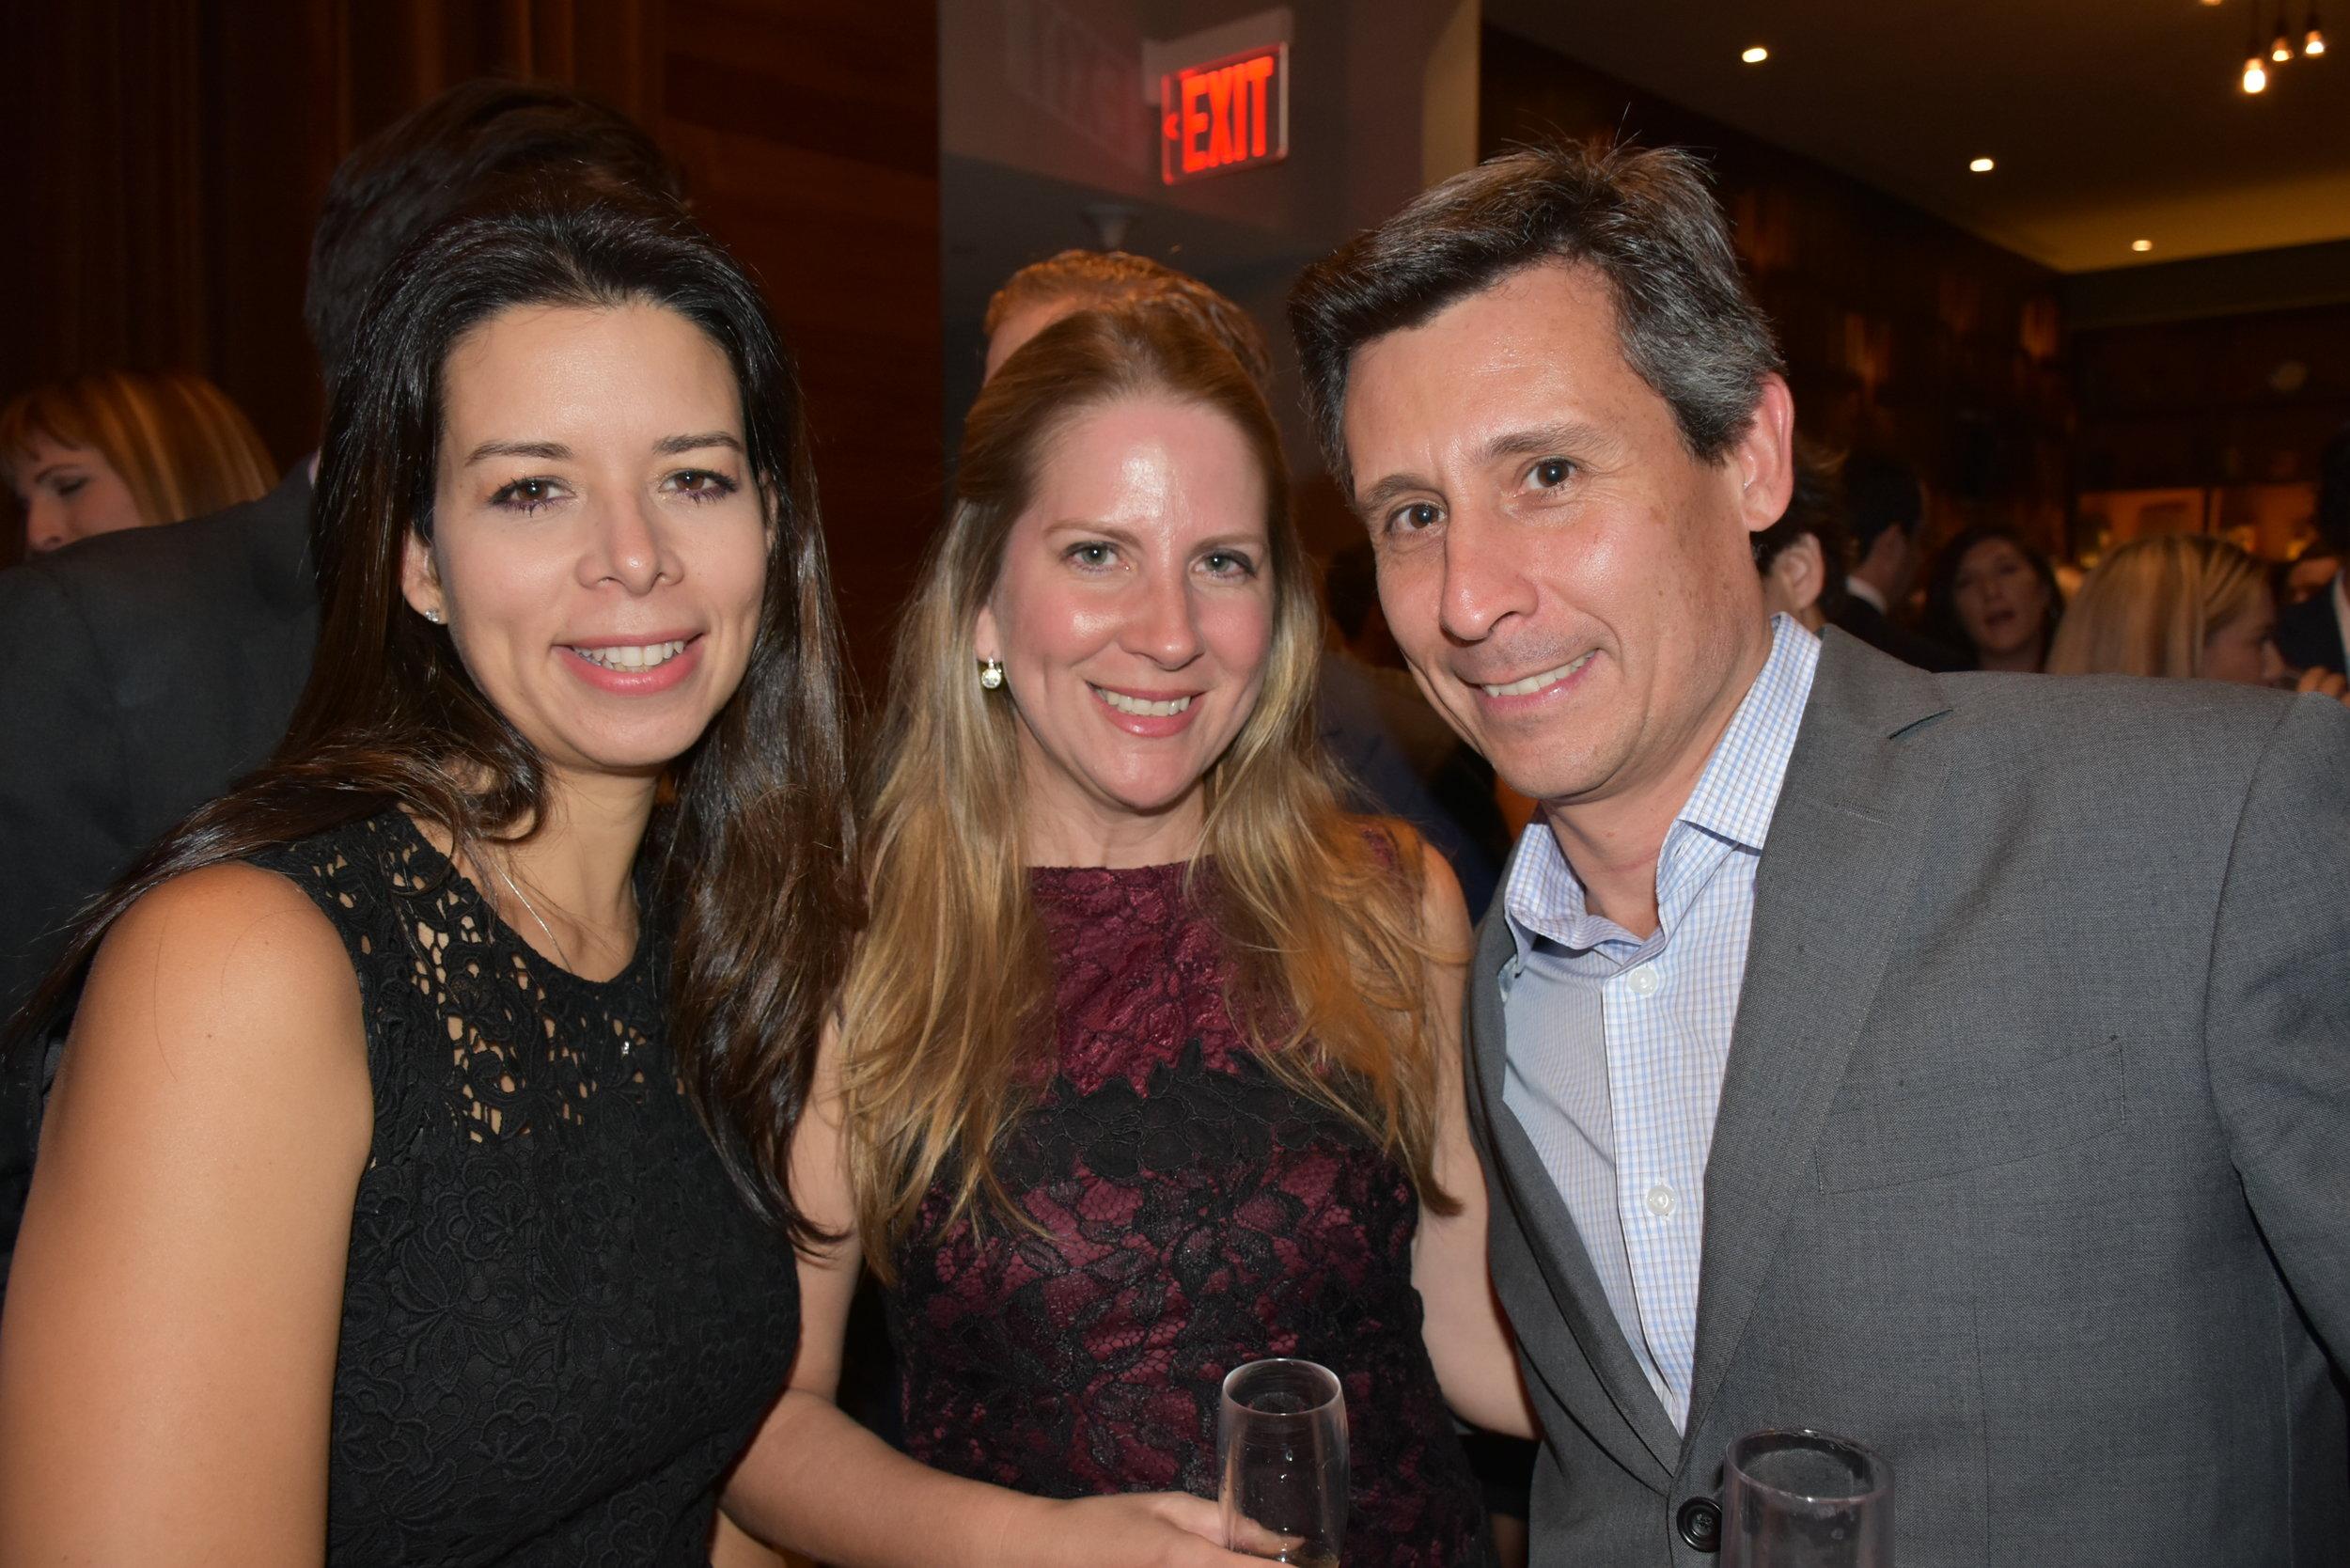 DSC_4788 -Marianela Faria, Juliette Roux y Augusto Urmeneta.JPG